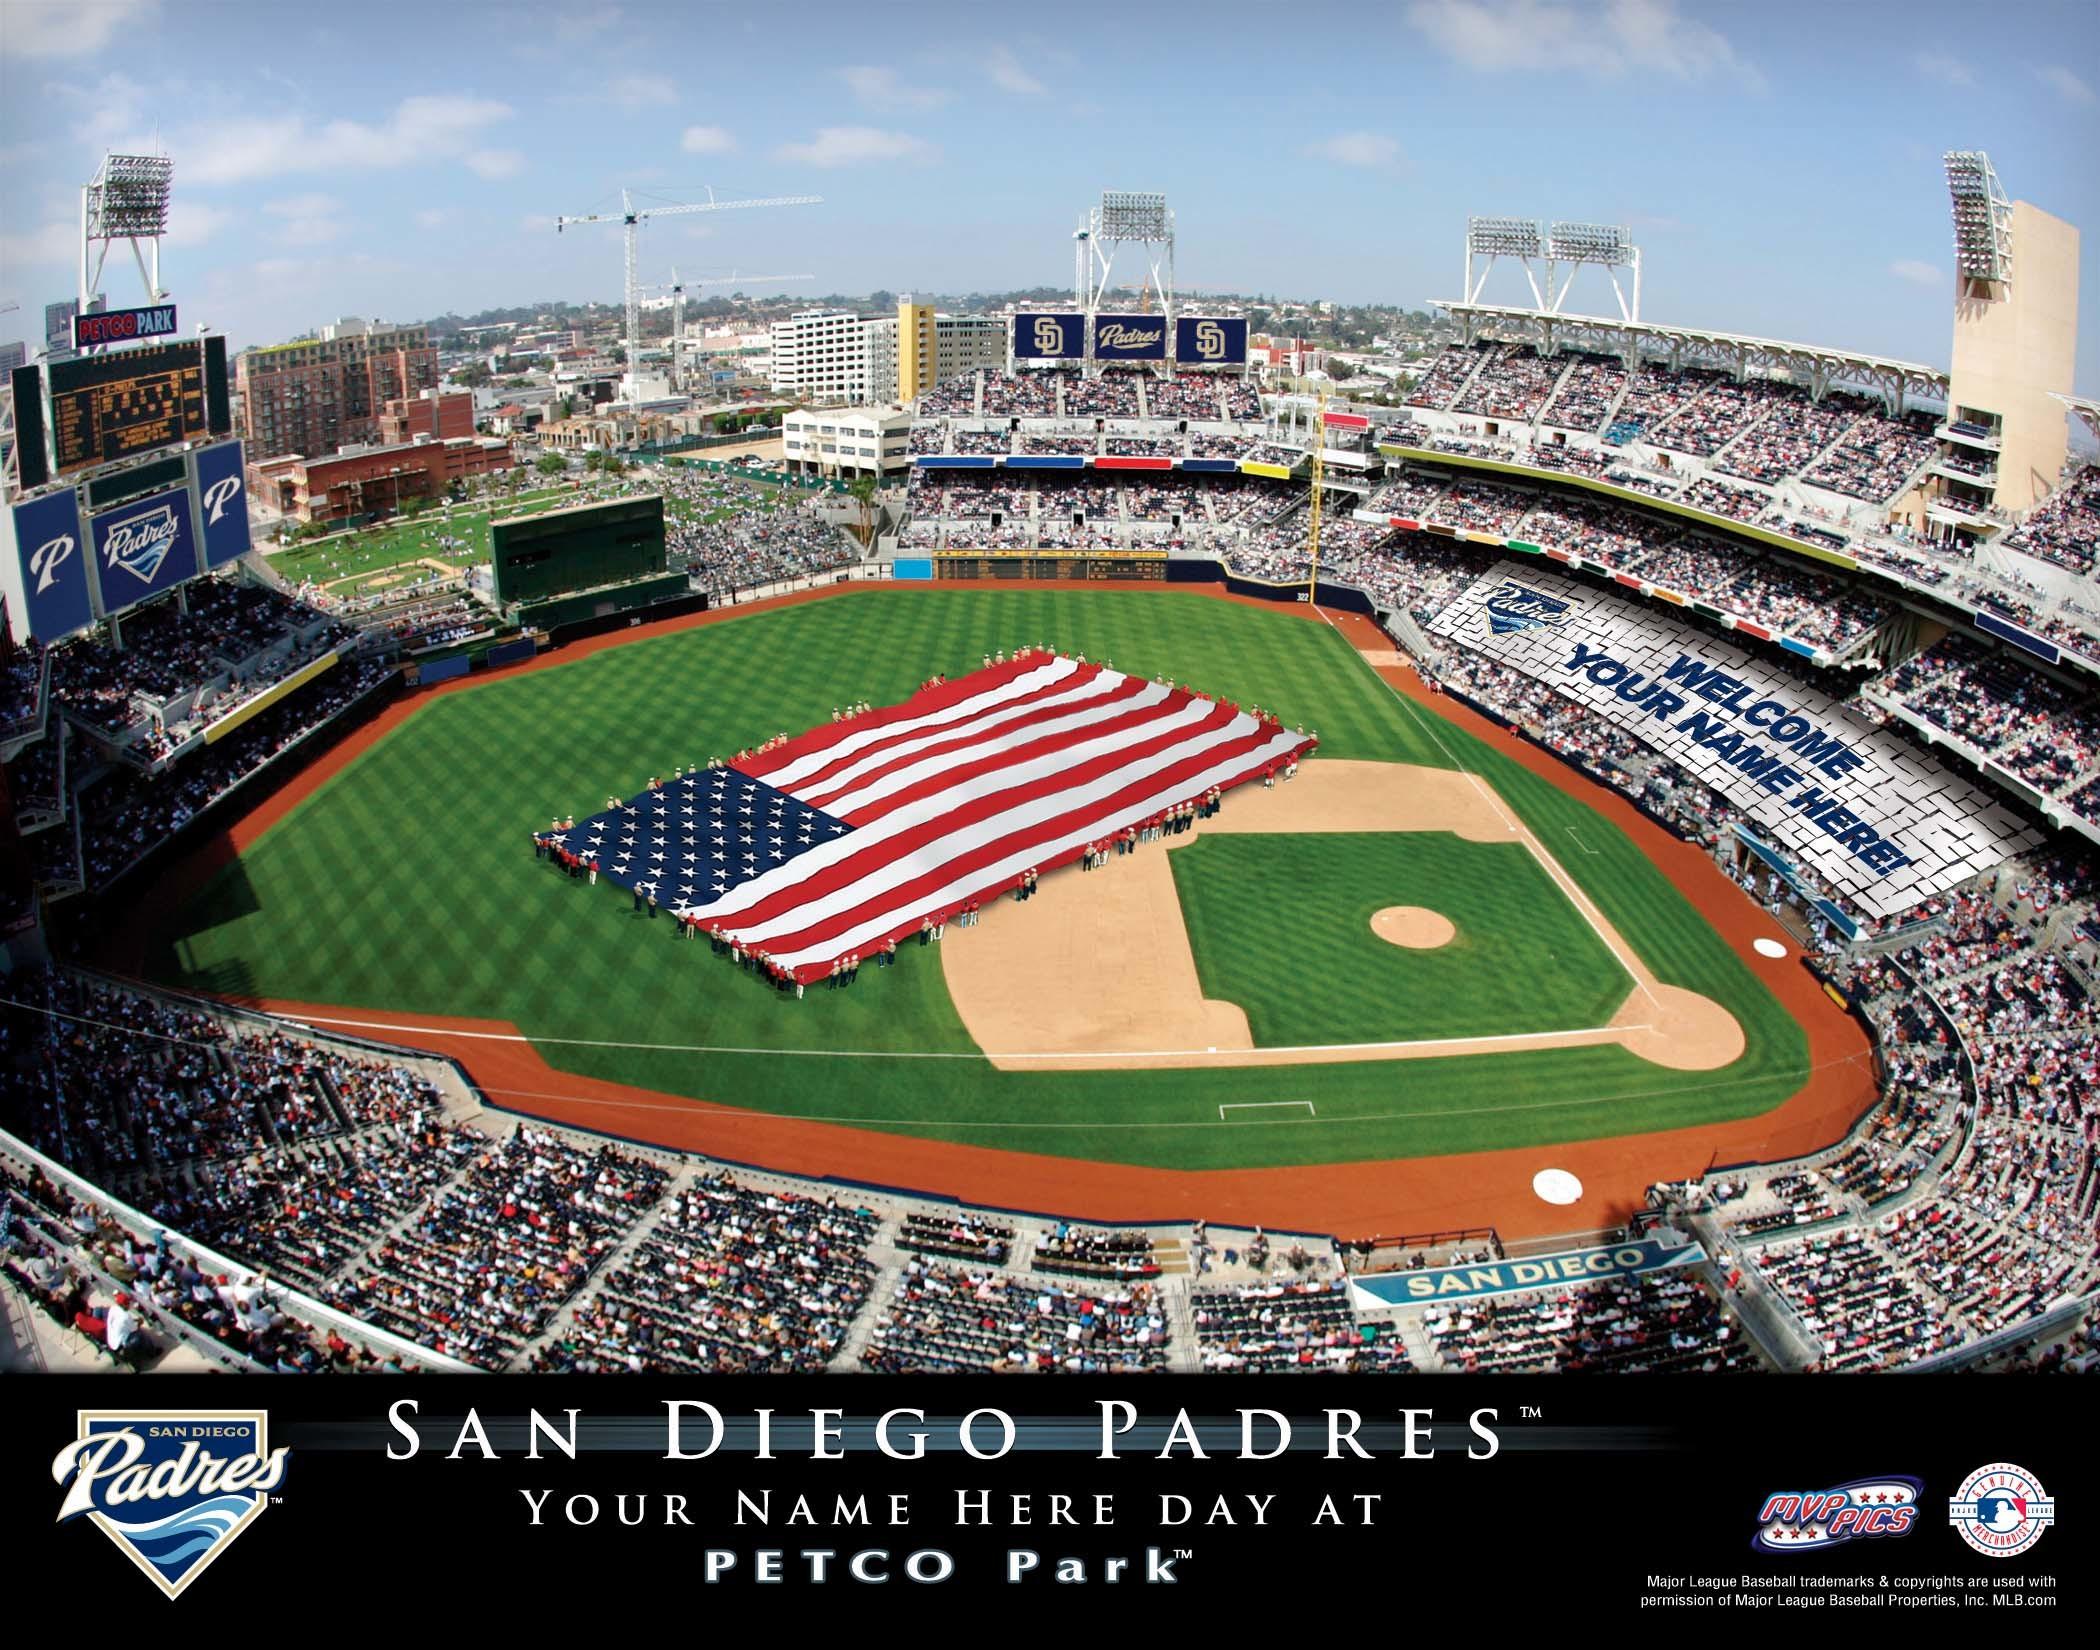 SAN DIEGO PADRES mlb baseball (2) wallpaper | | 231816 |  WallpaperUP